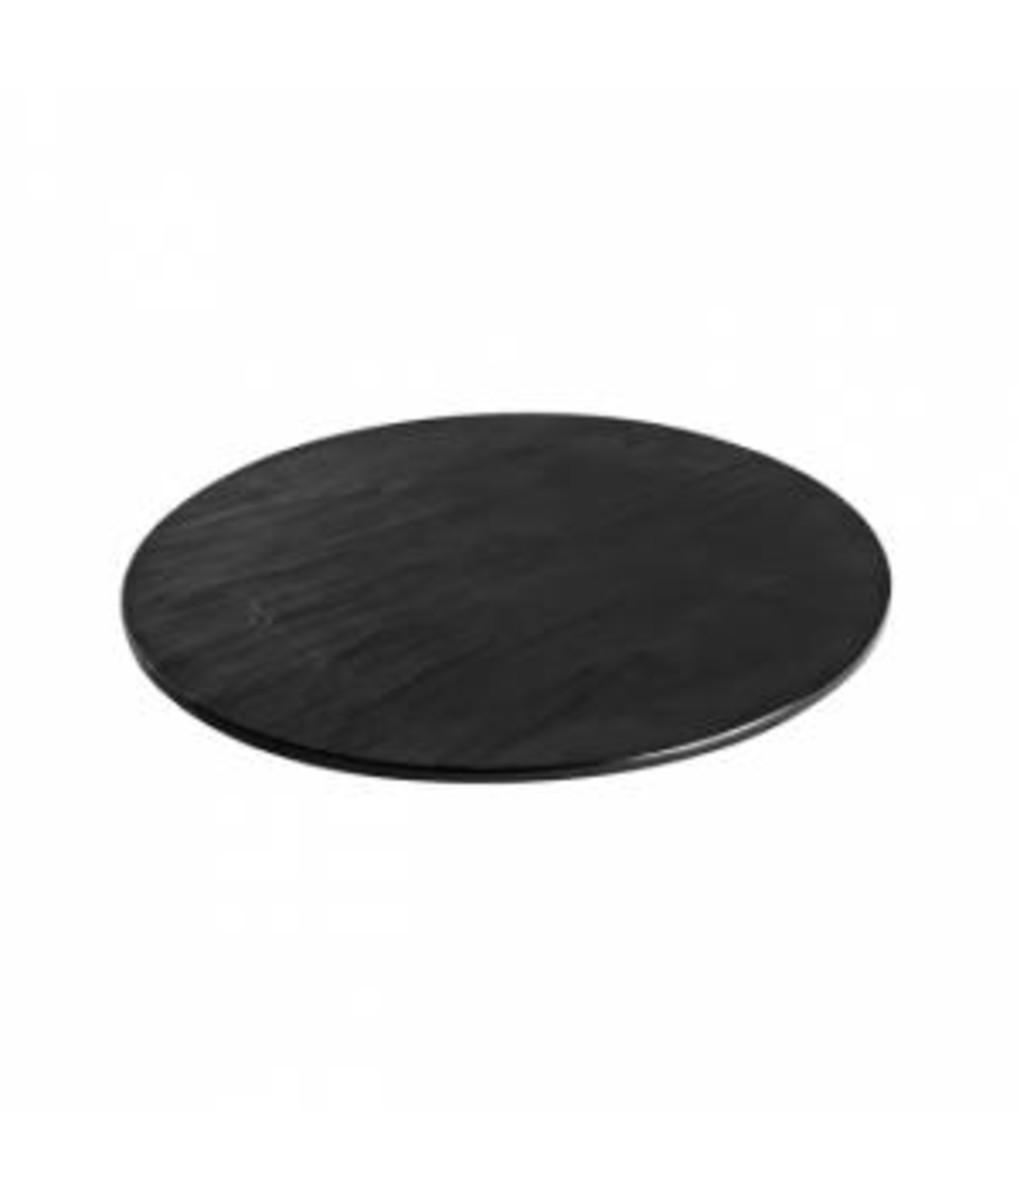 Platter (slate Look) Round 330mm Melamine by Ryner